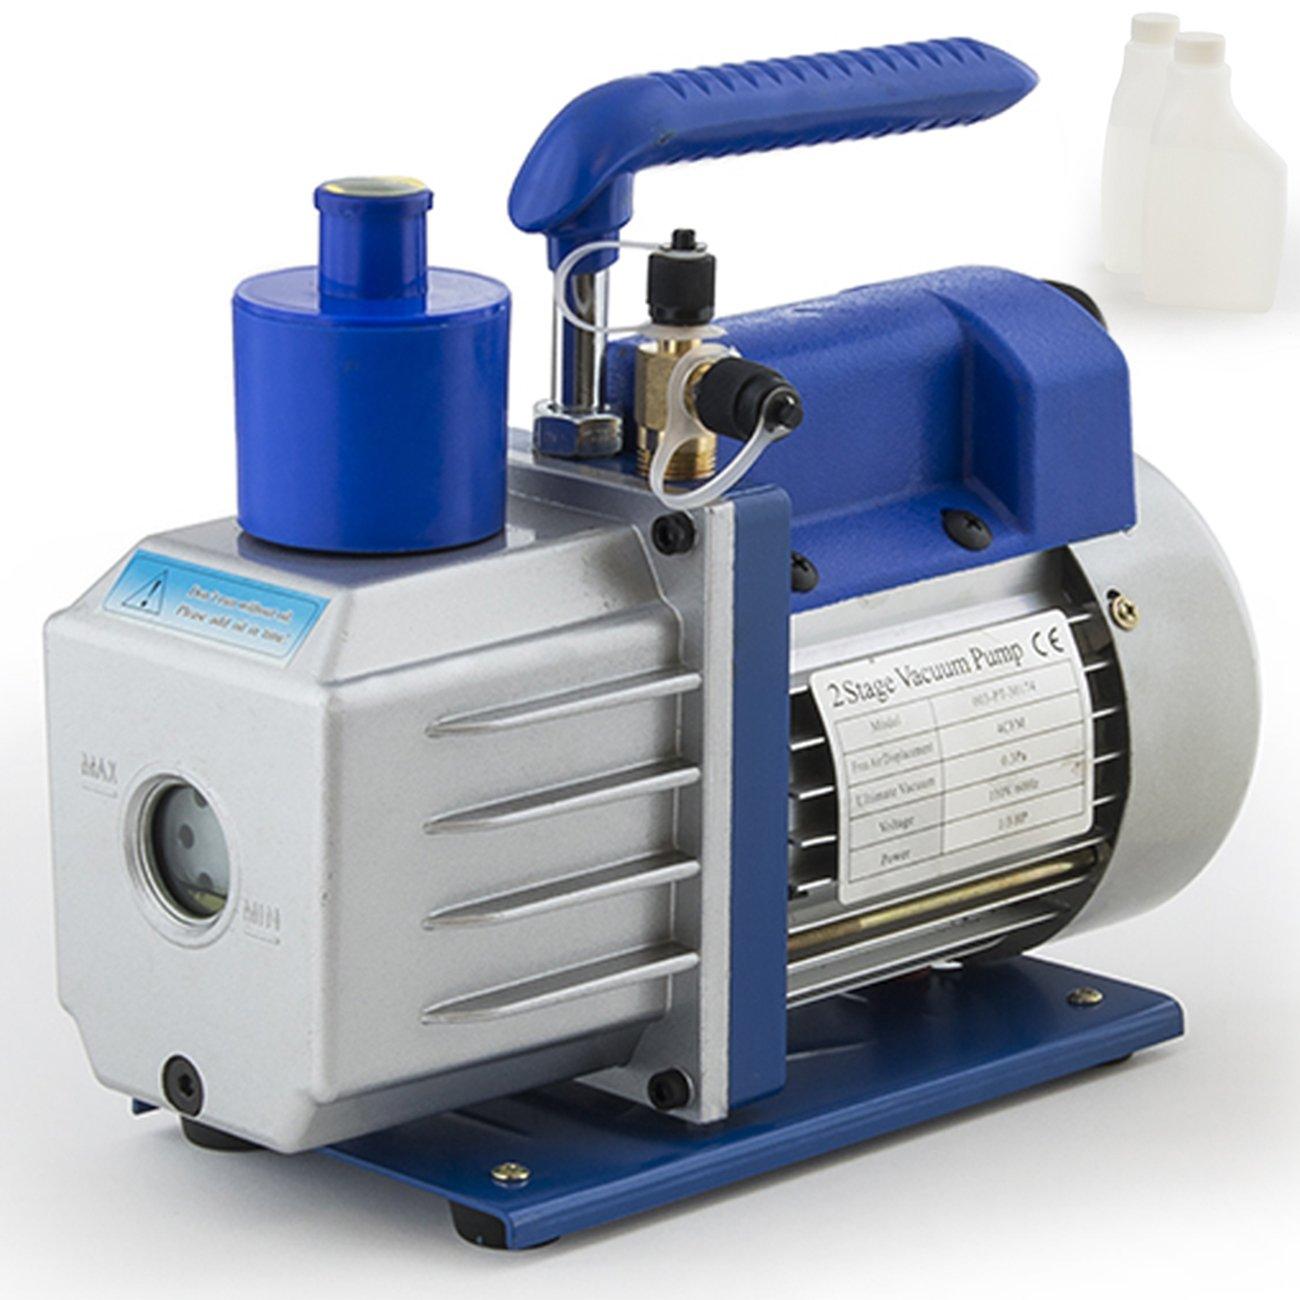 ARKSEN Electric 4CFM 2-Stage Pump Rotary Vane Deep Air Conditioner Vacuum HVAC 1/3HP w/ (2) Free Oil Bottle